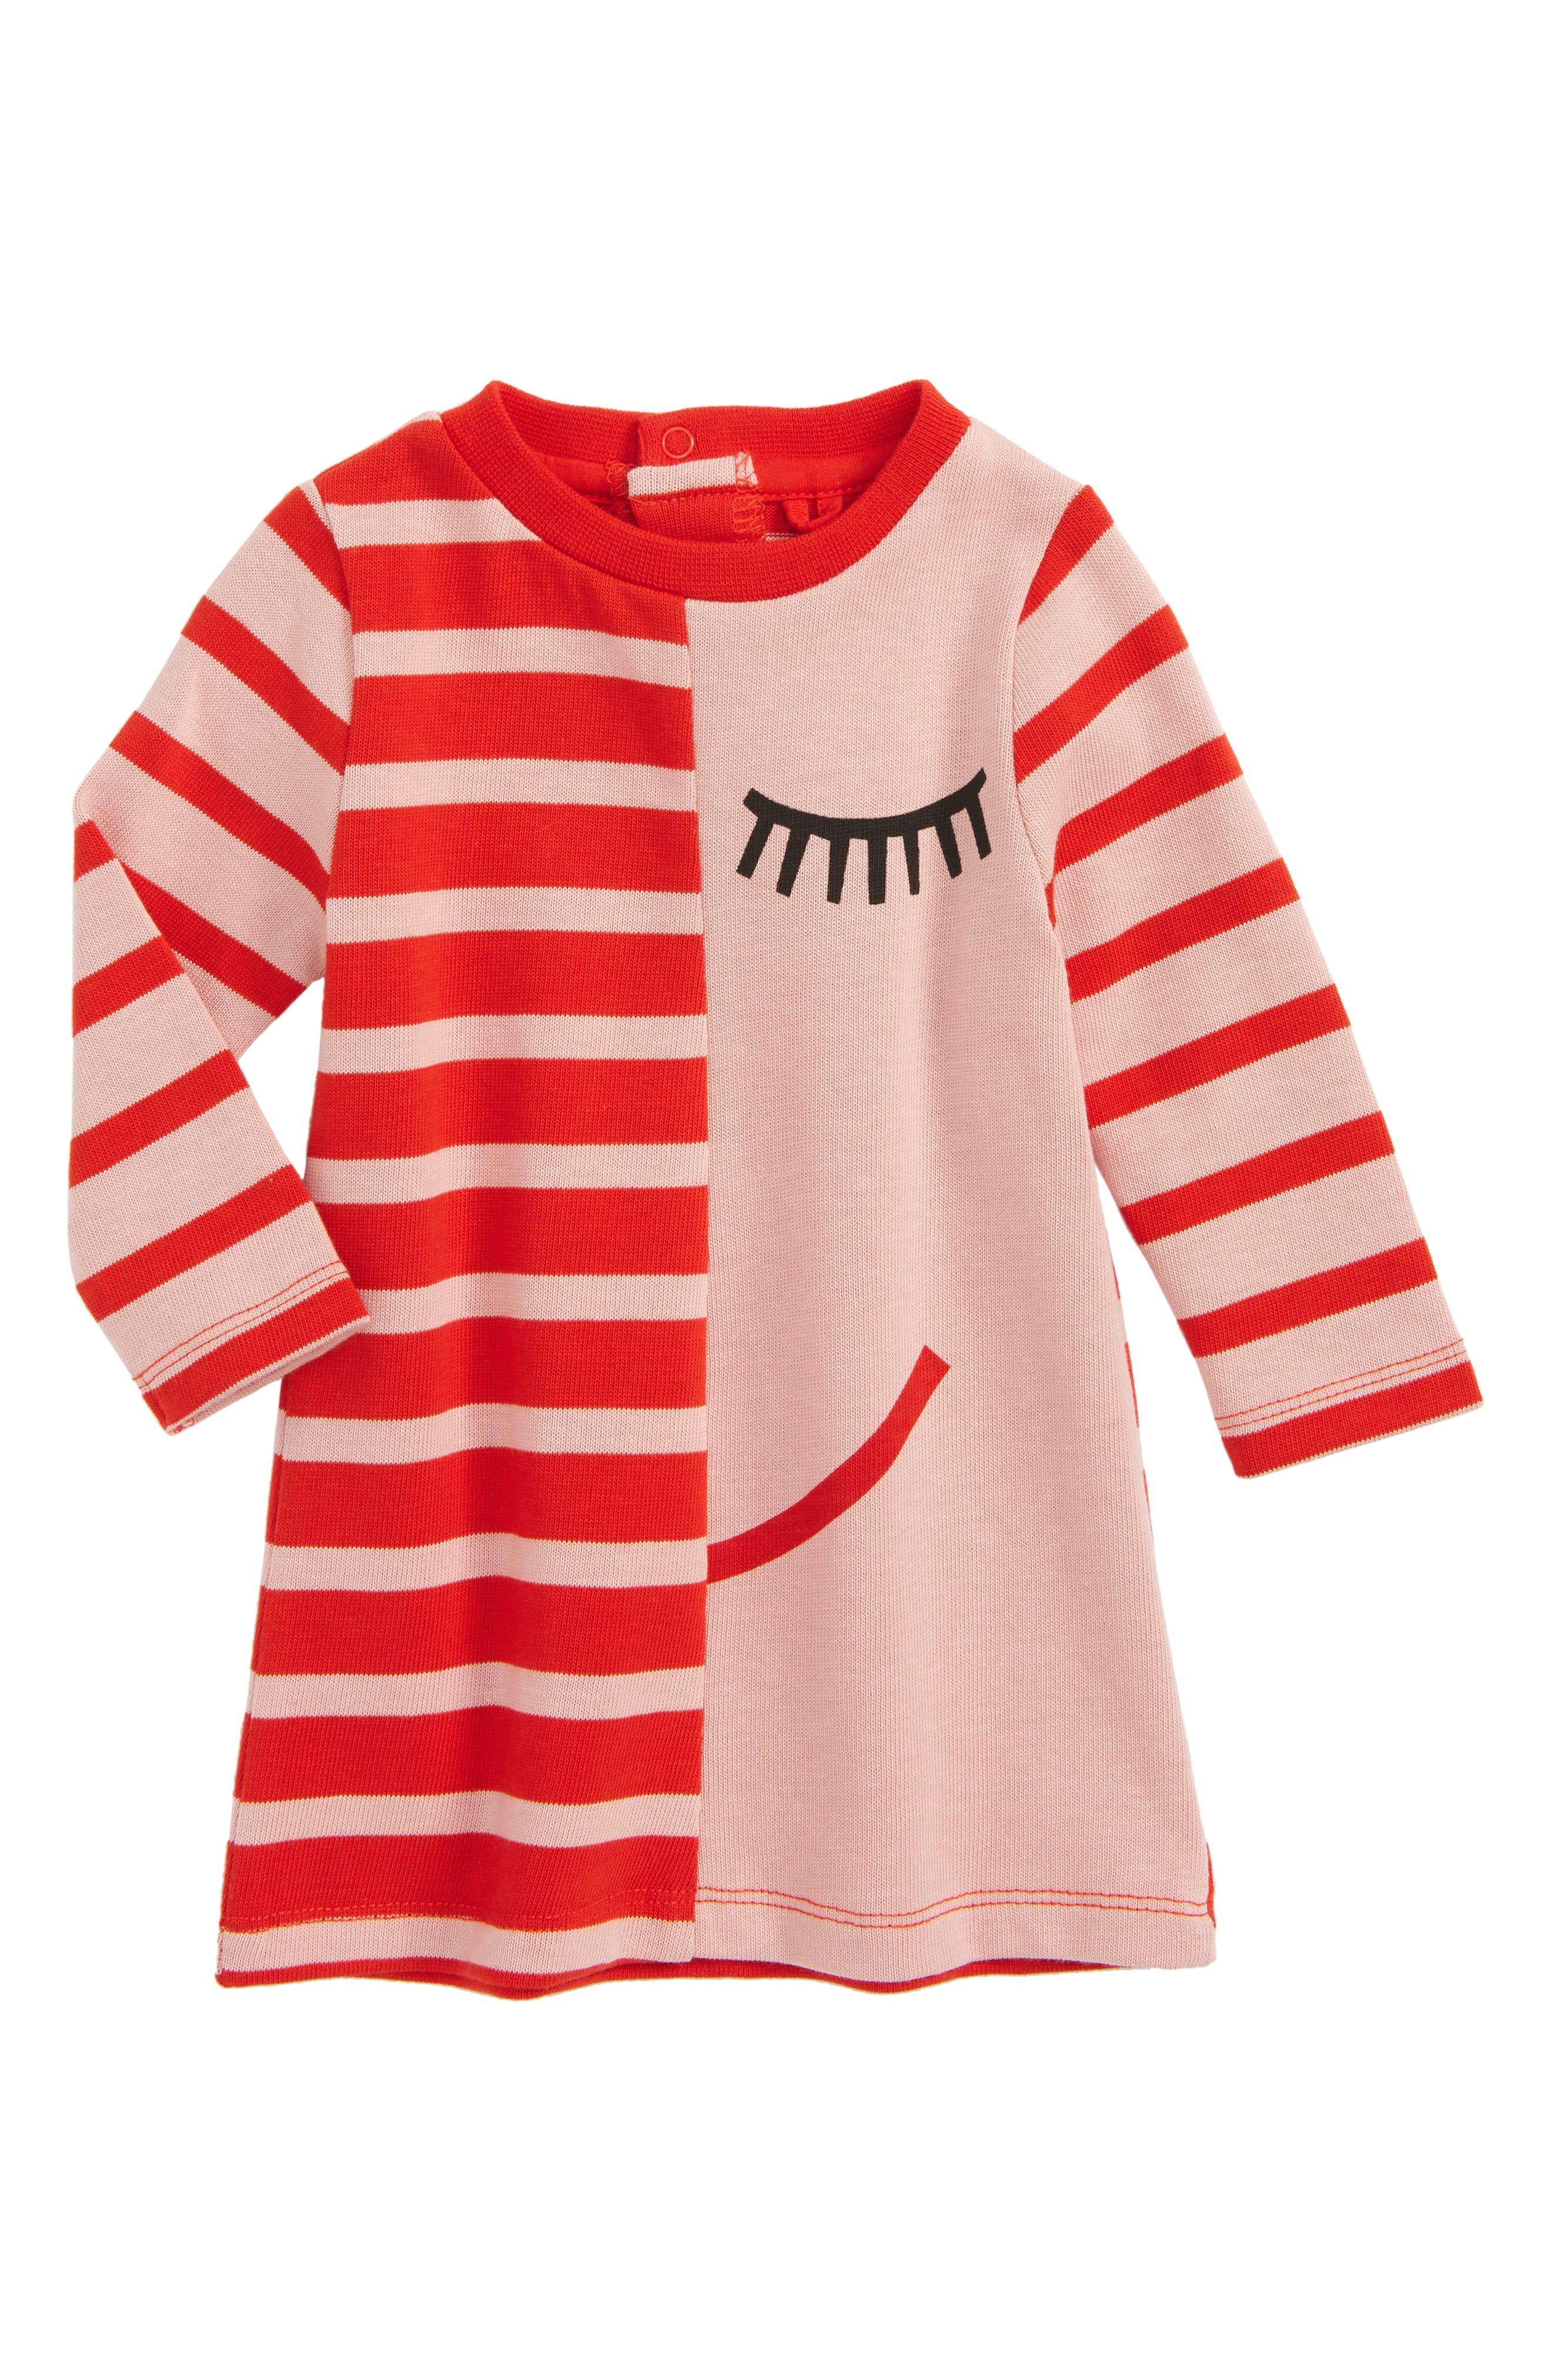 Alternate Image 1 Selected - Stella McCartney Kids Stripe Jersey Dress (Baby Girls)